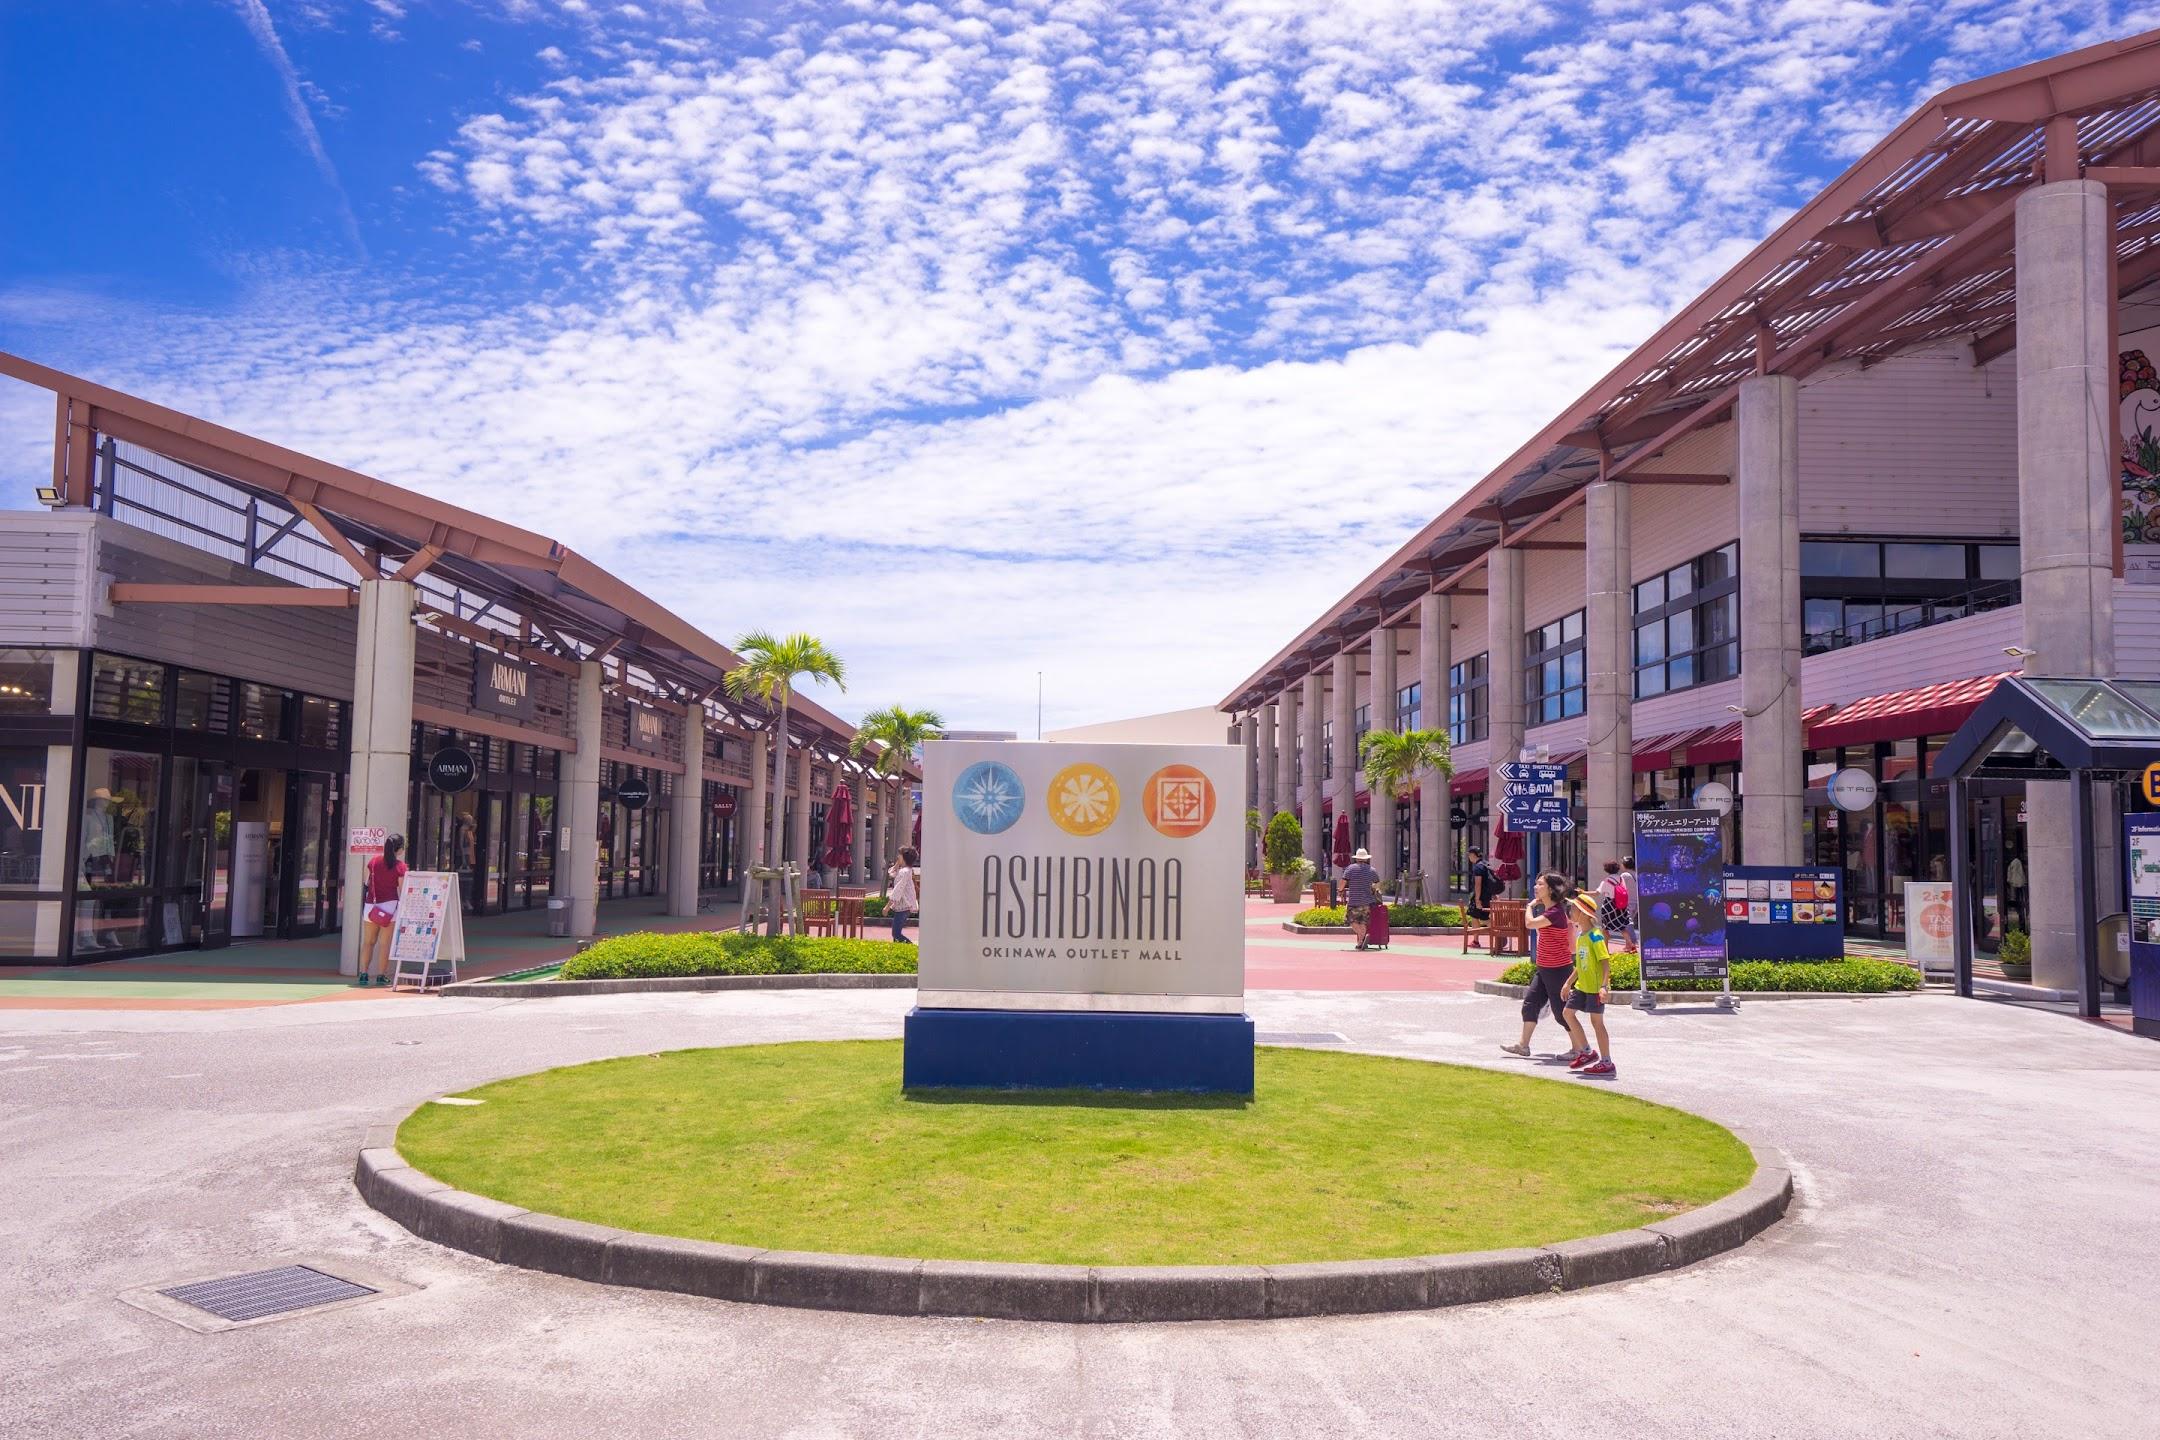 Okinawa Outlet Mall Ashibinaa4